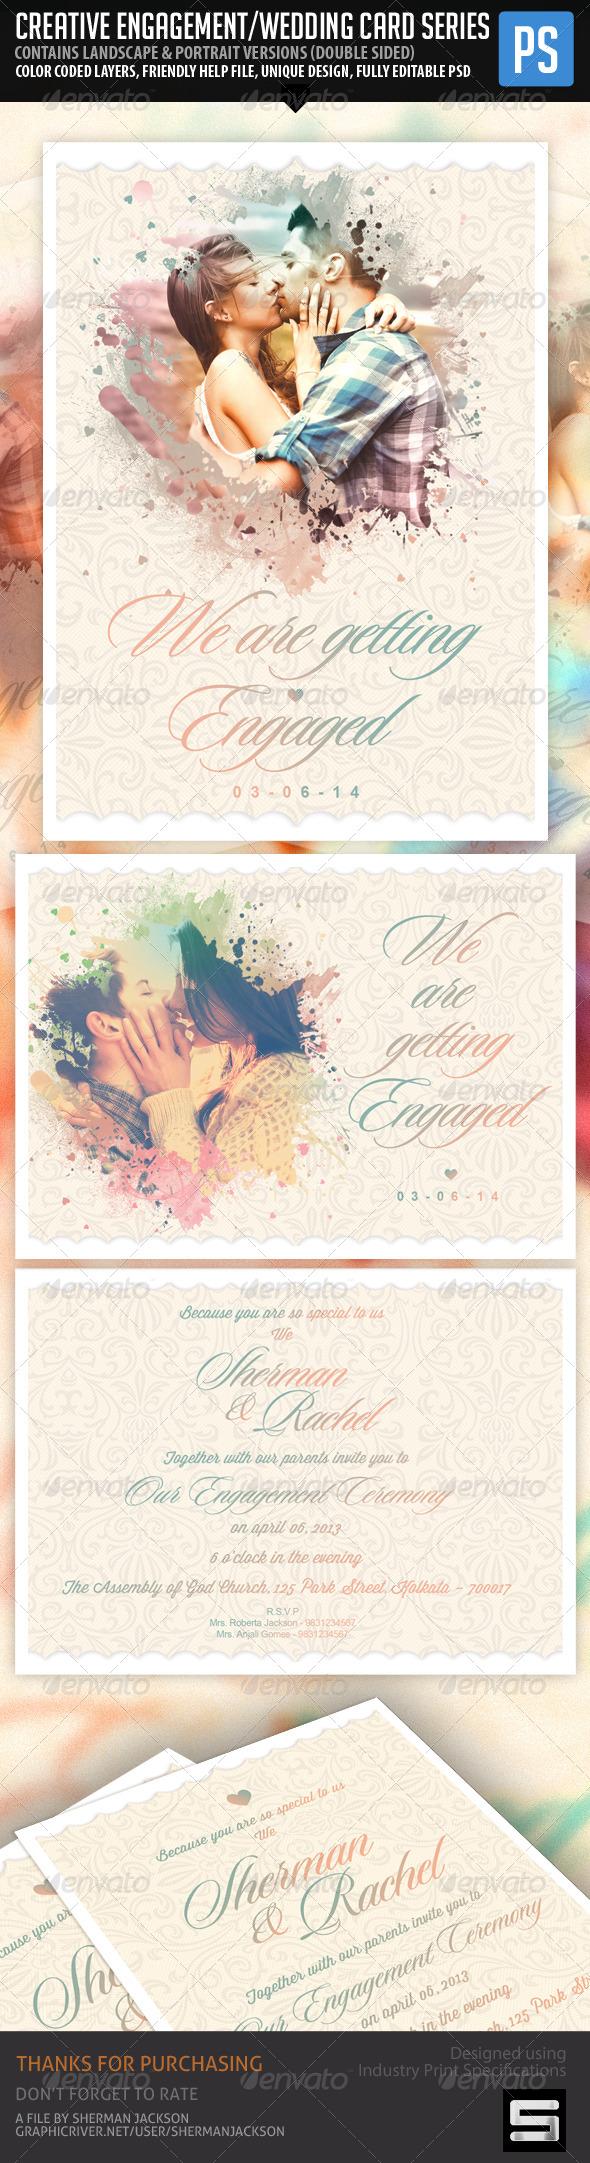 Creative Engagement Wedding Card